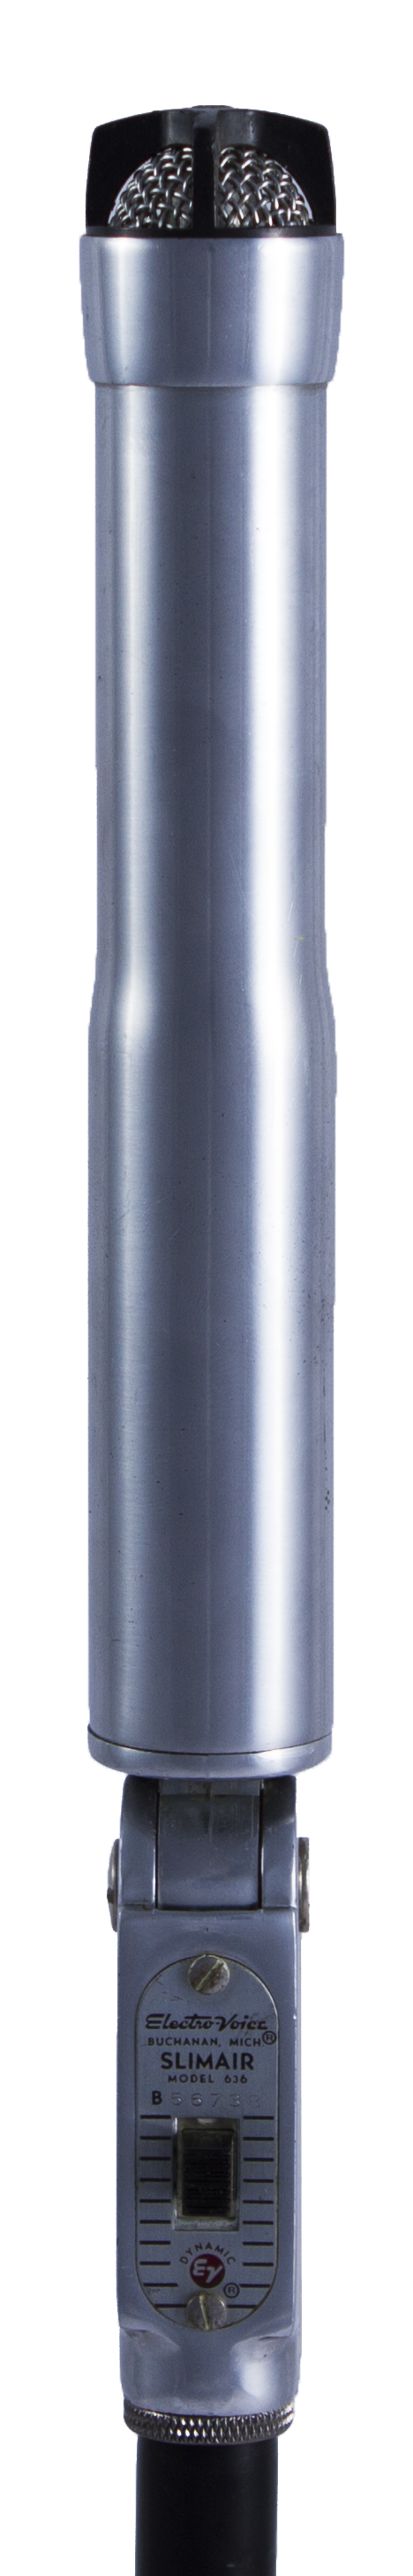 Electro Voice Slimair 636